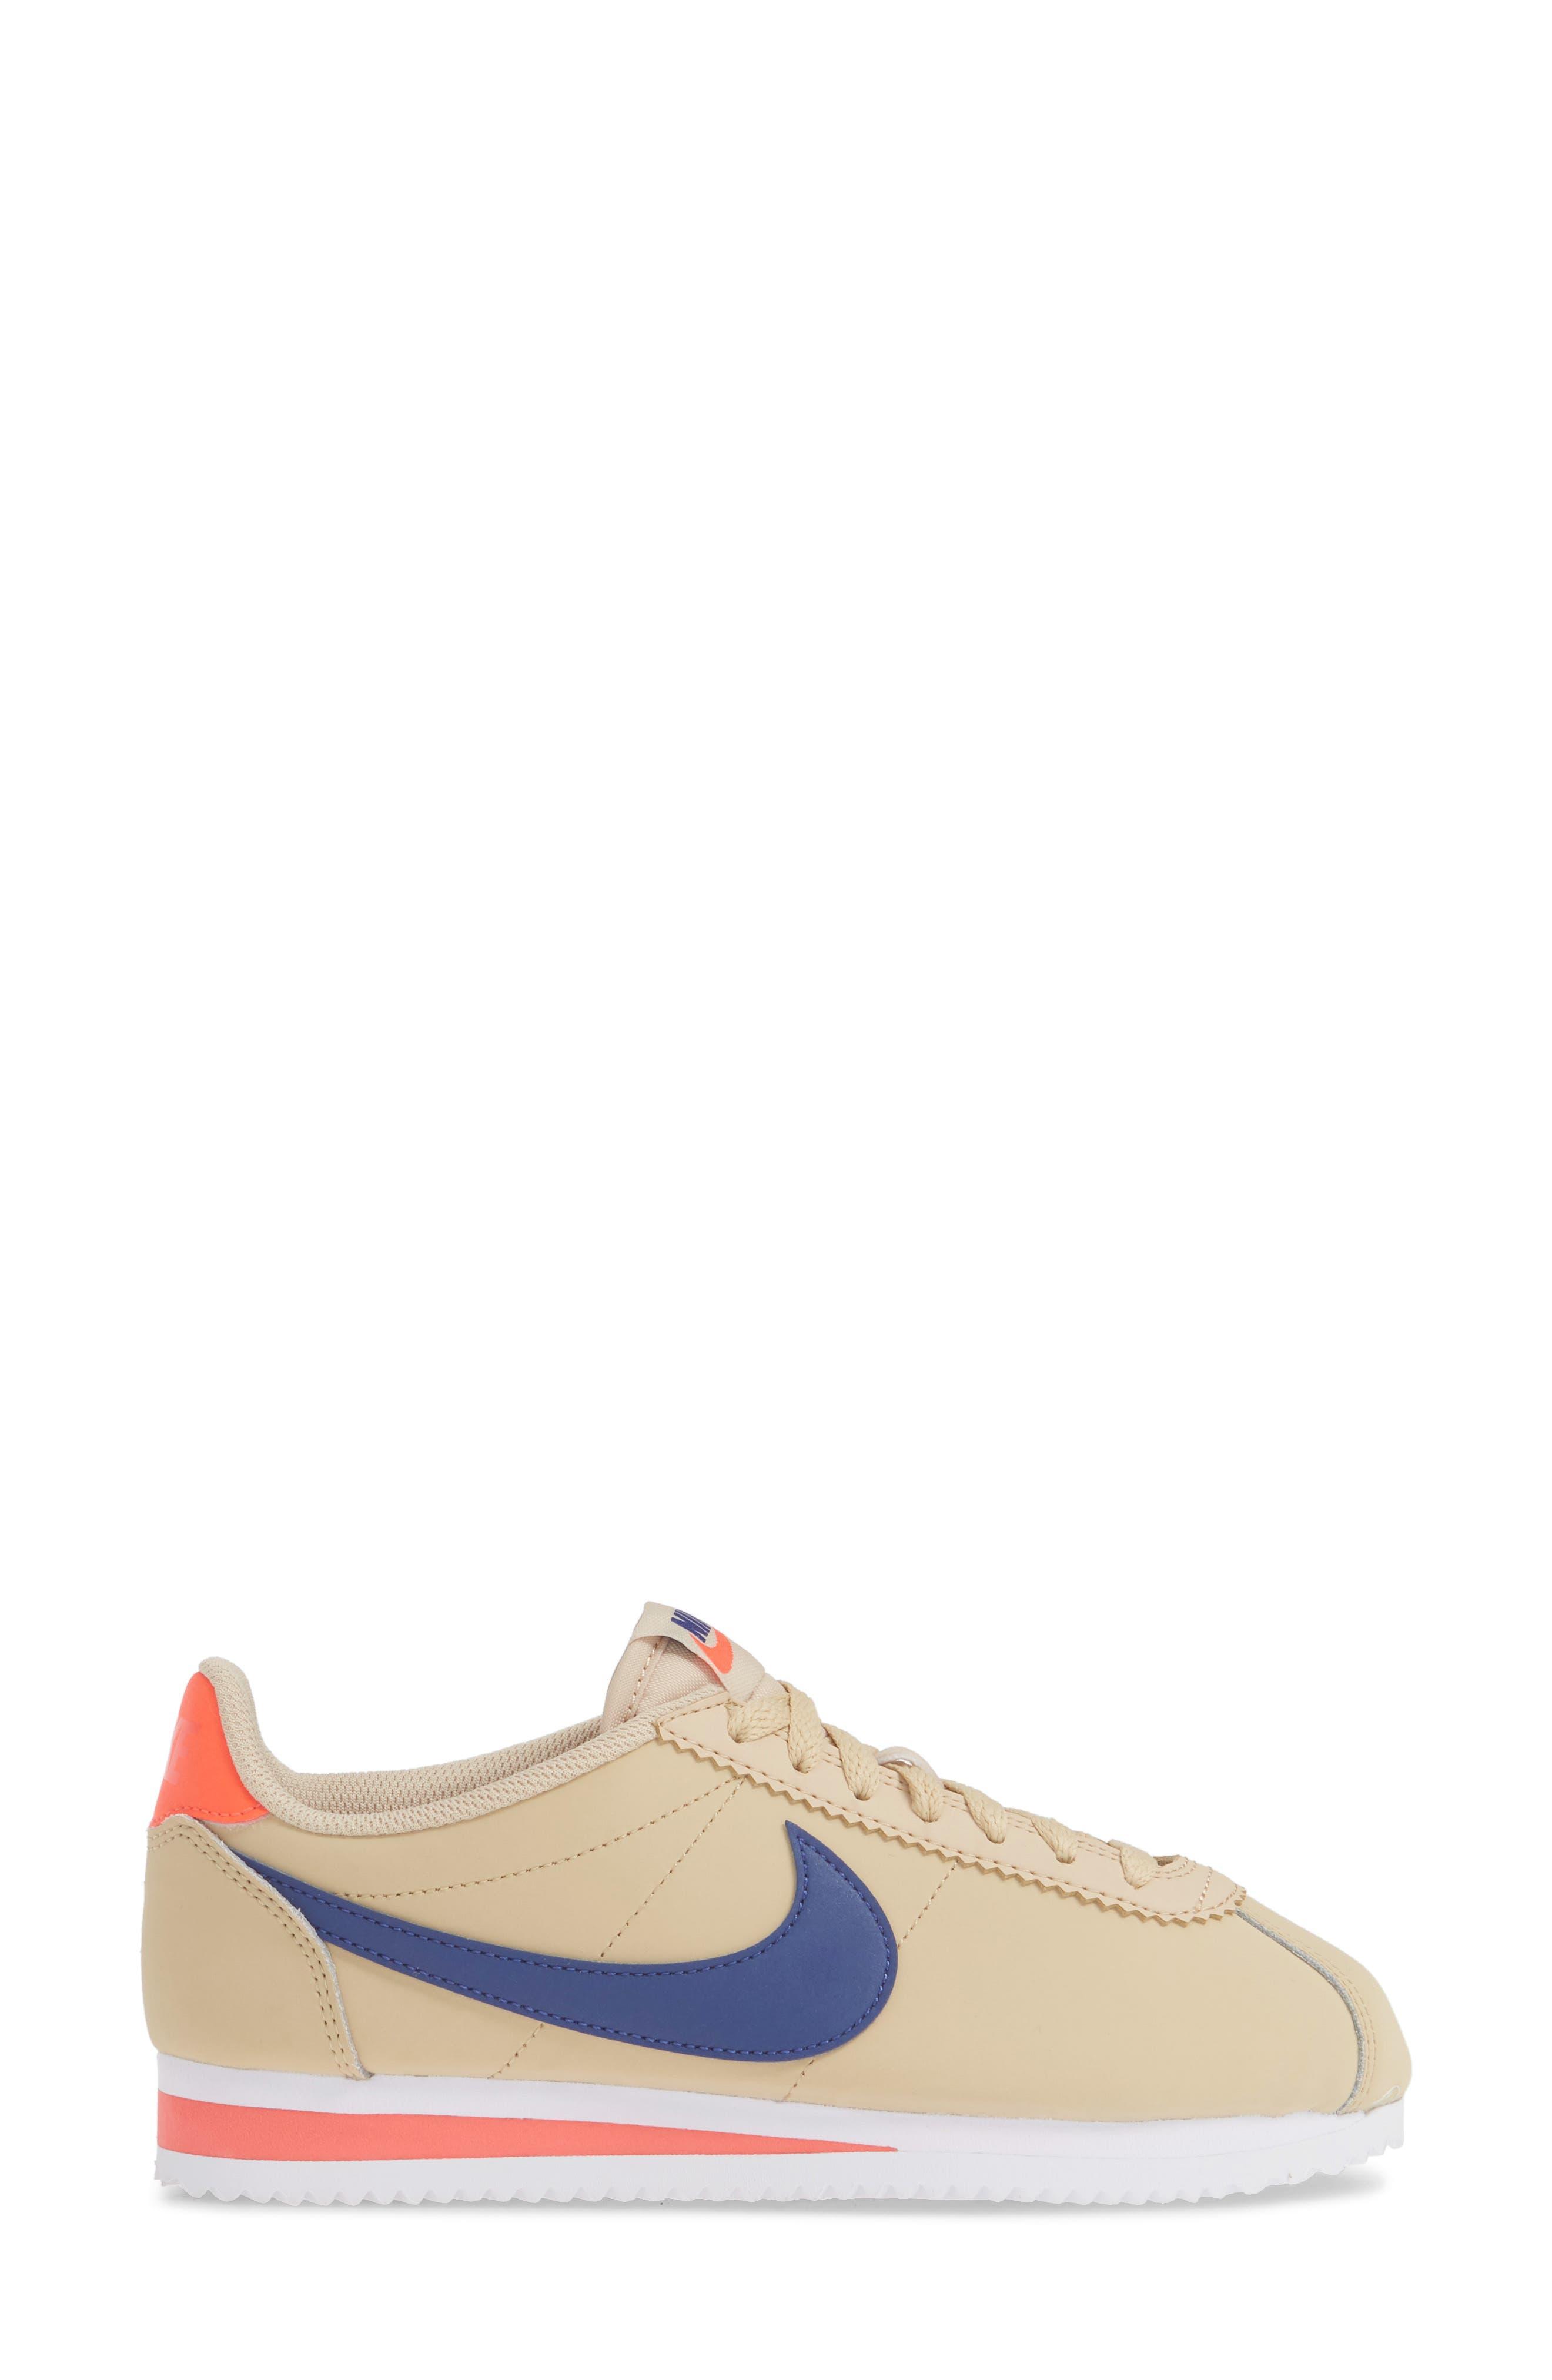 ,                             Classic Cortez Sneaker,                             Alternate thumbnail 3, color,                             DESERT ORE/ DEEP ROYAL BLUE